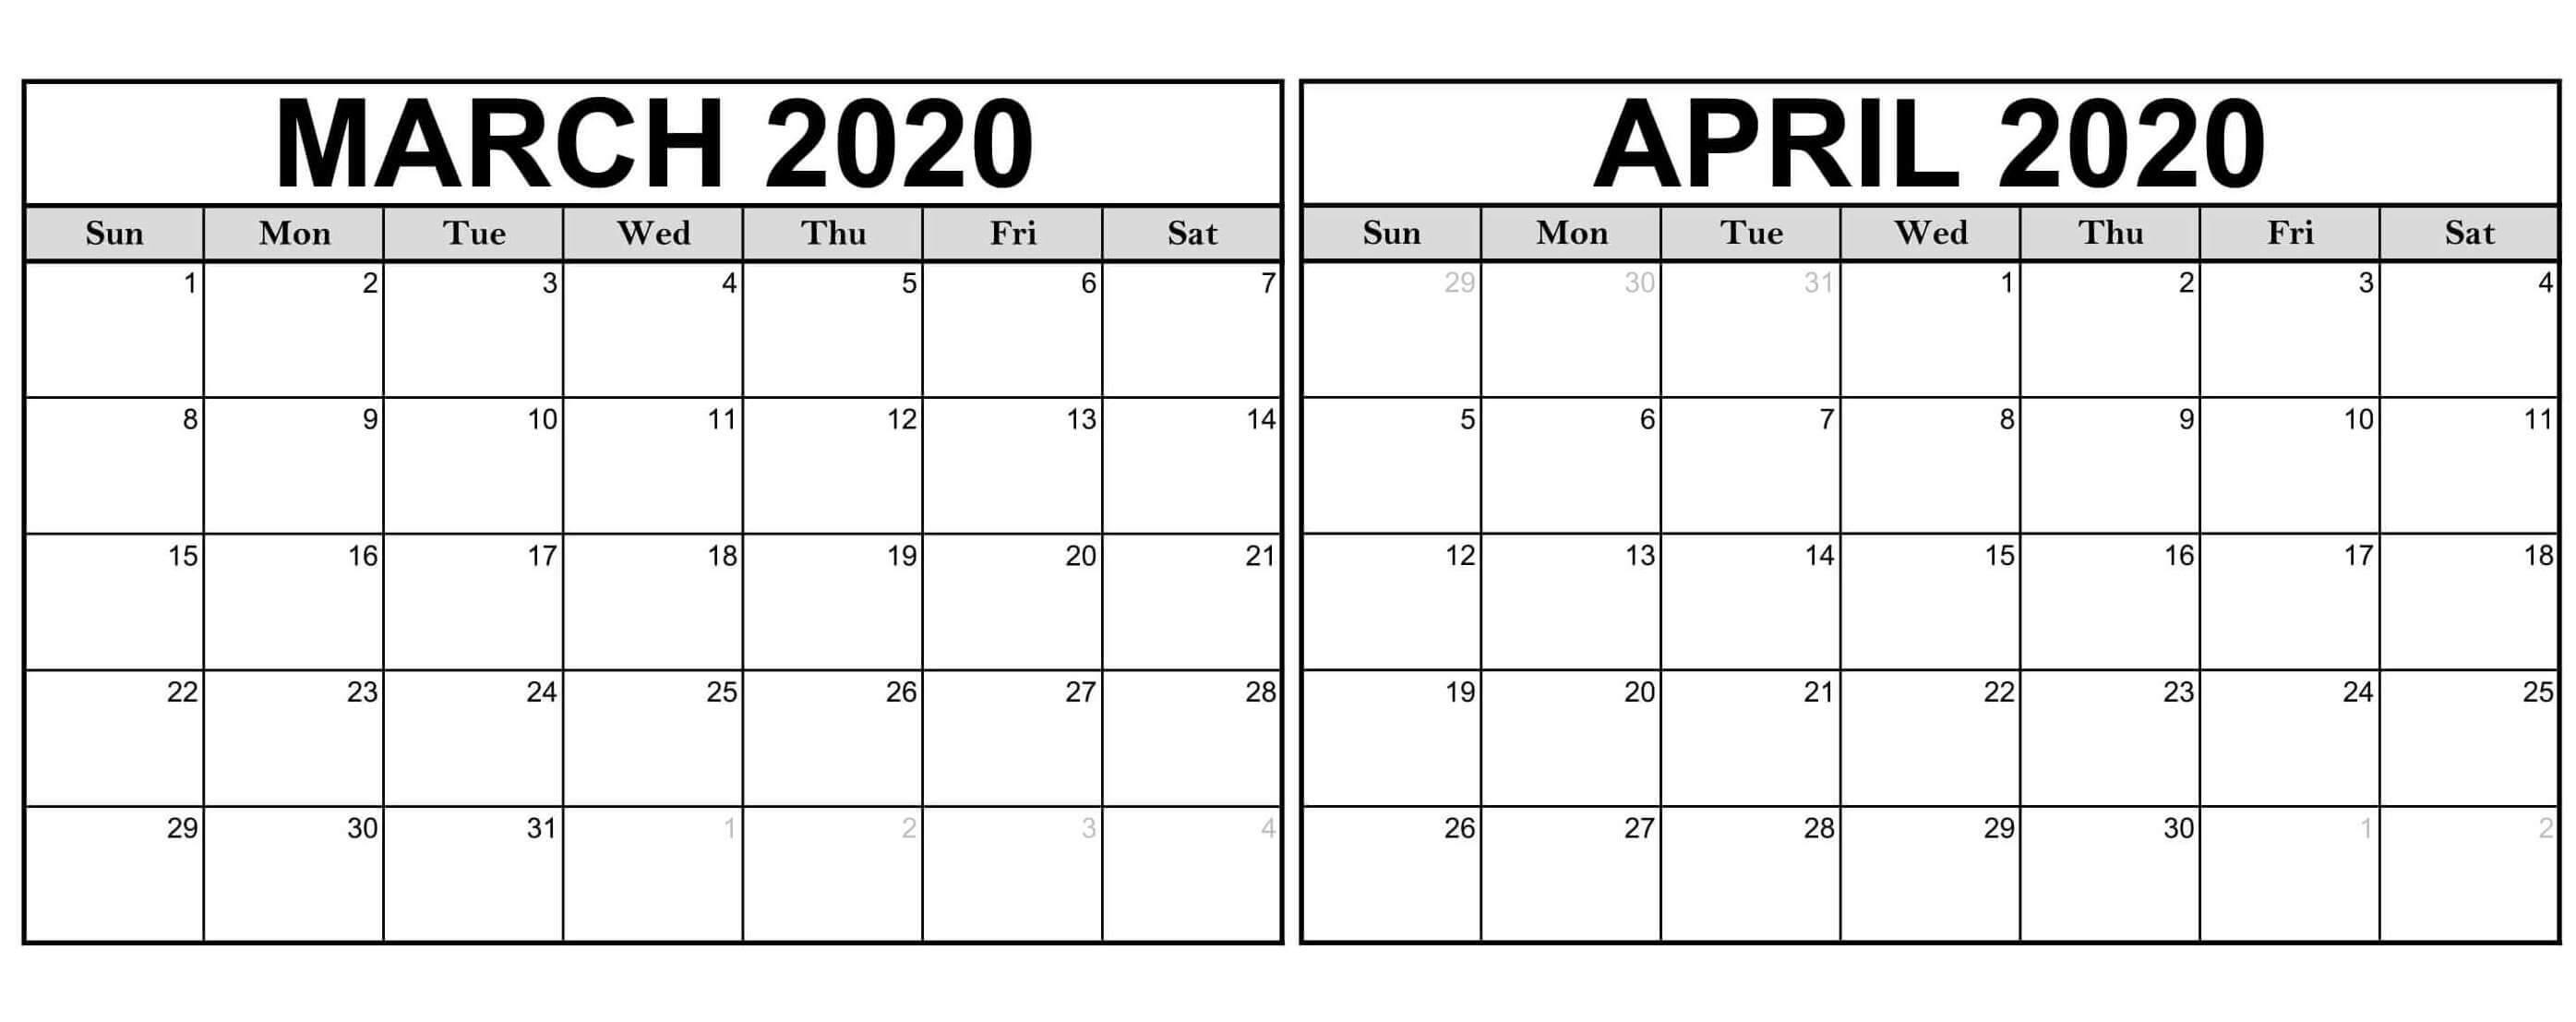 Free March April Calendar 2020 Printable - 2019 Calendars